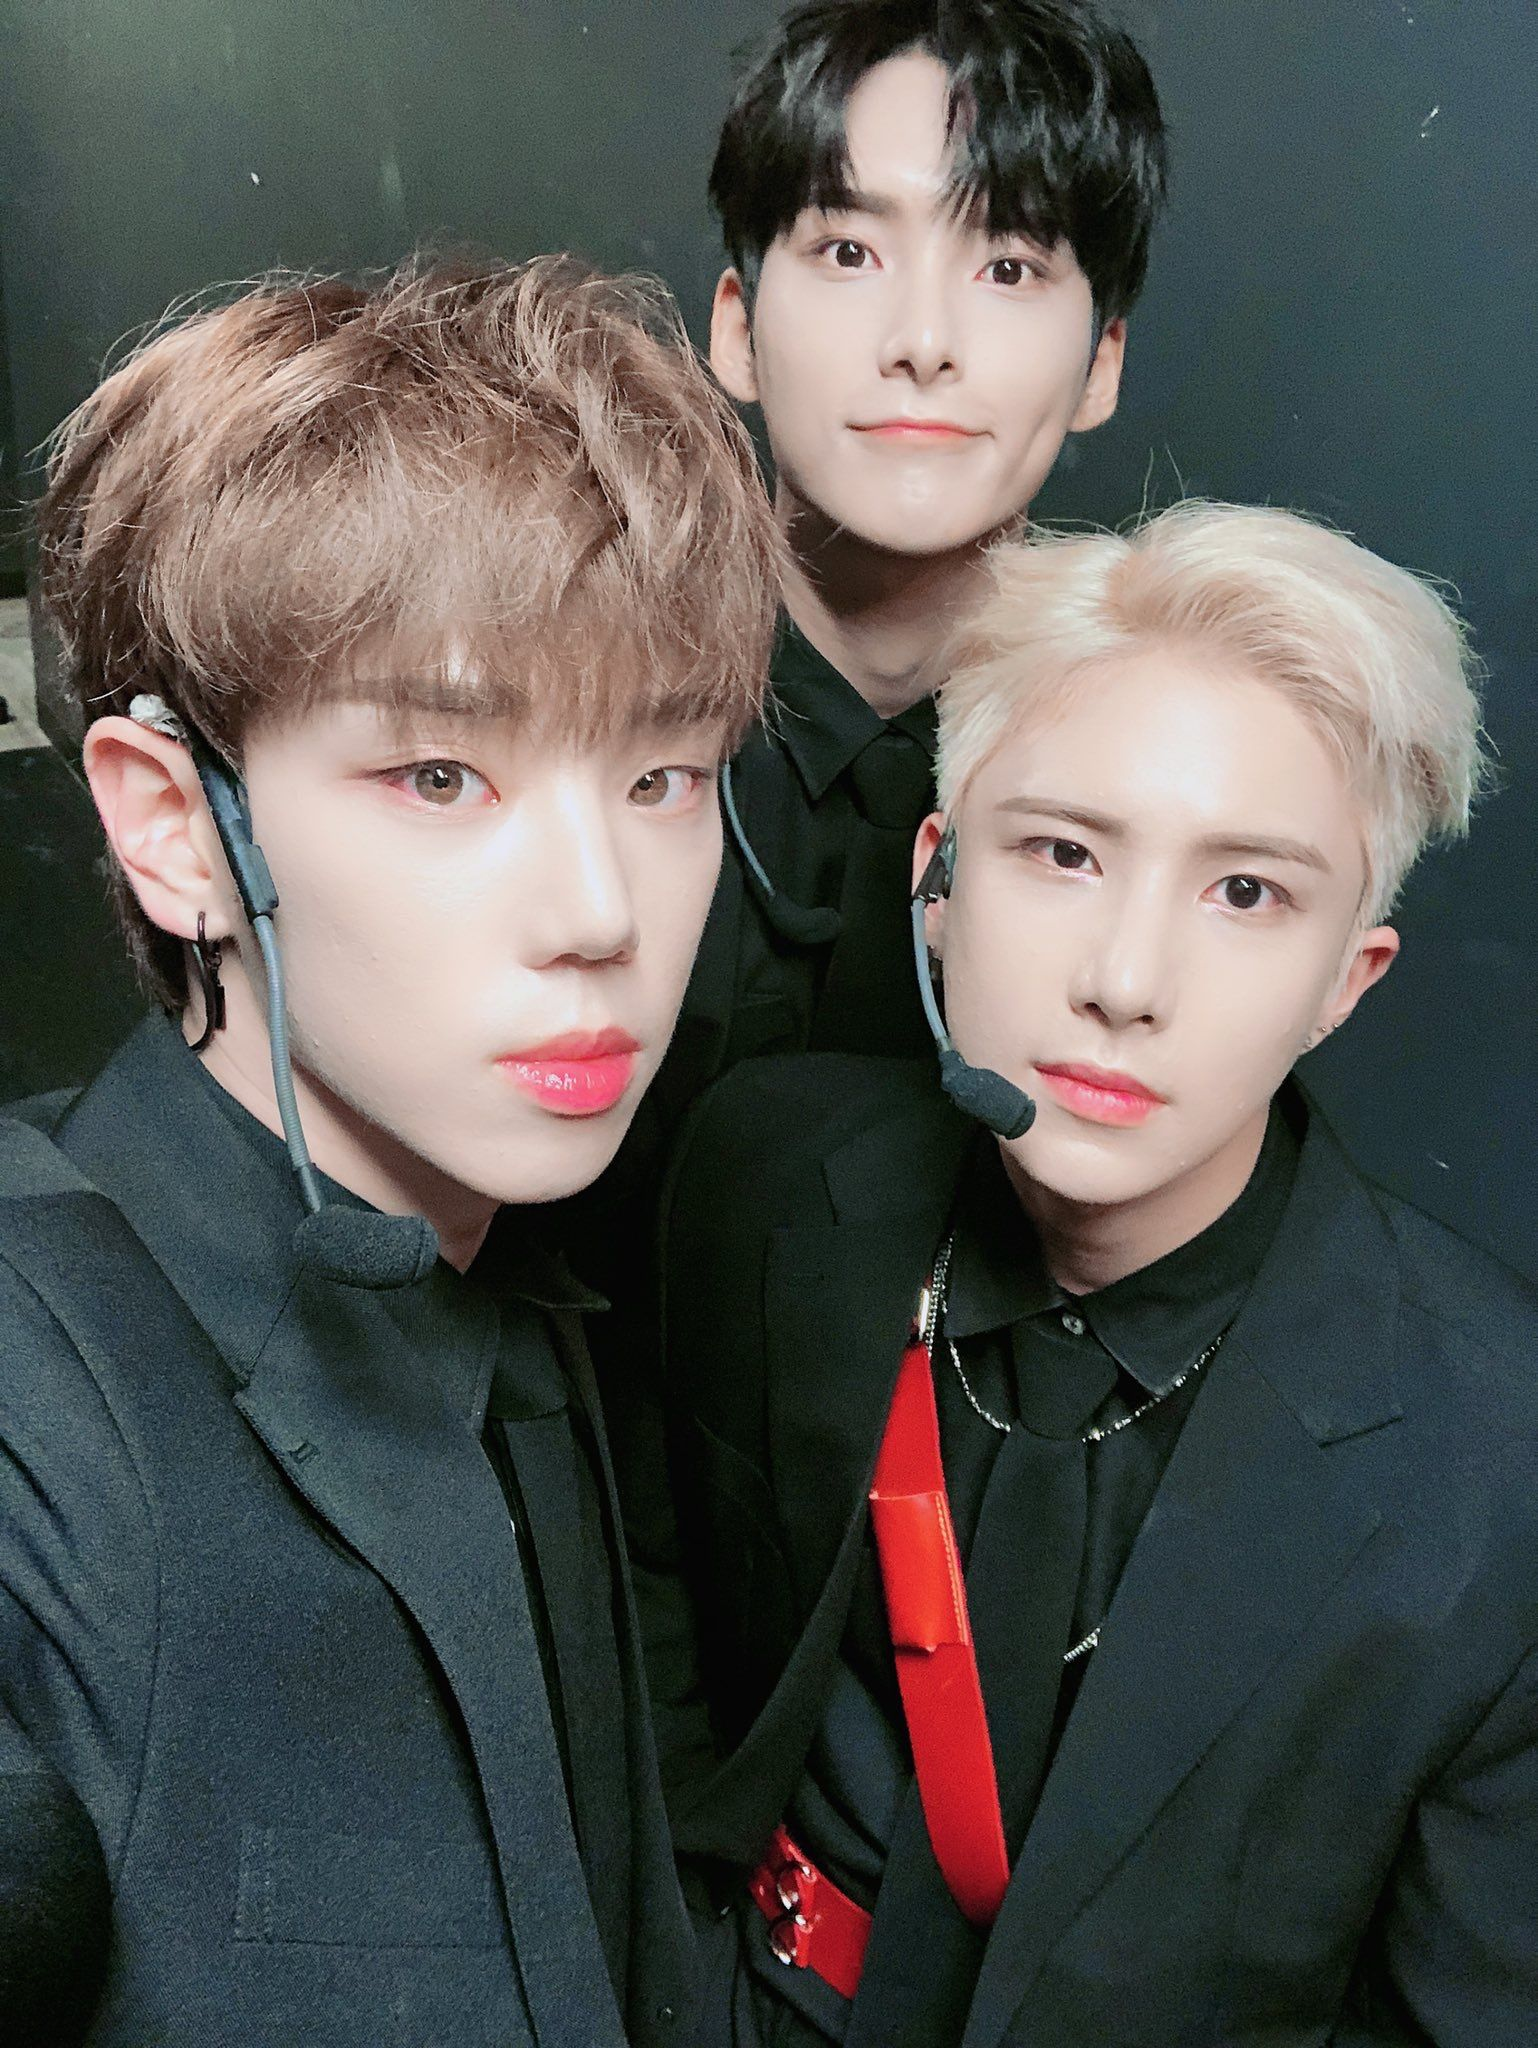 ACE byeongkwan junhee WOW   Ace, Boy groups, Official